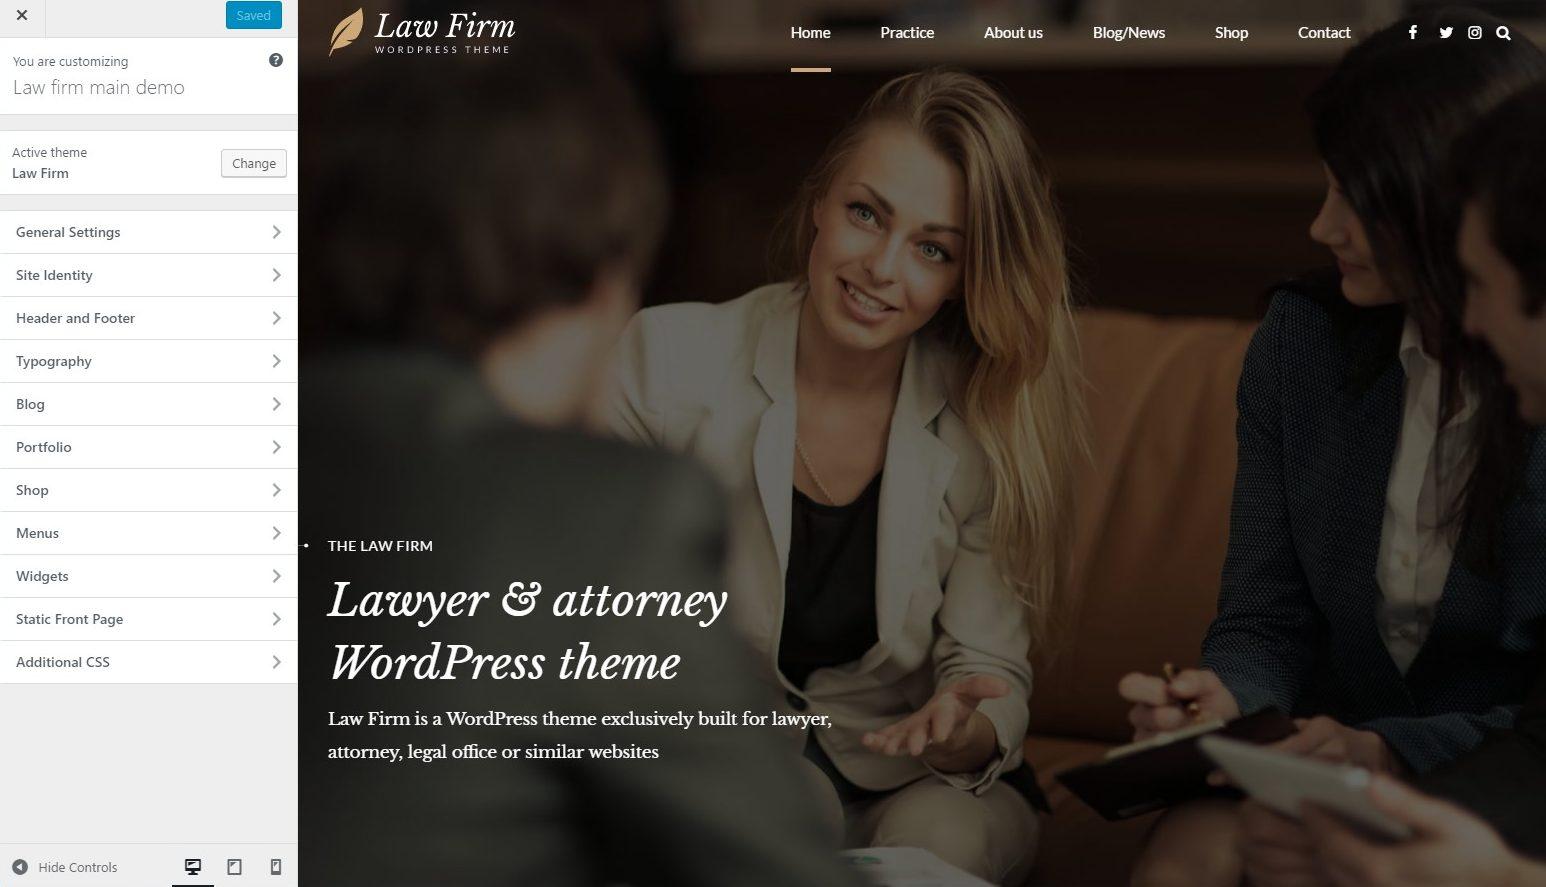 https://documentation.bold-themes.com/law-firm/wp-content/uploads/sites/15/2017/05/10-1-e1496309746201.jpg